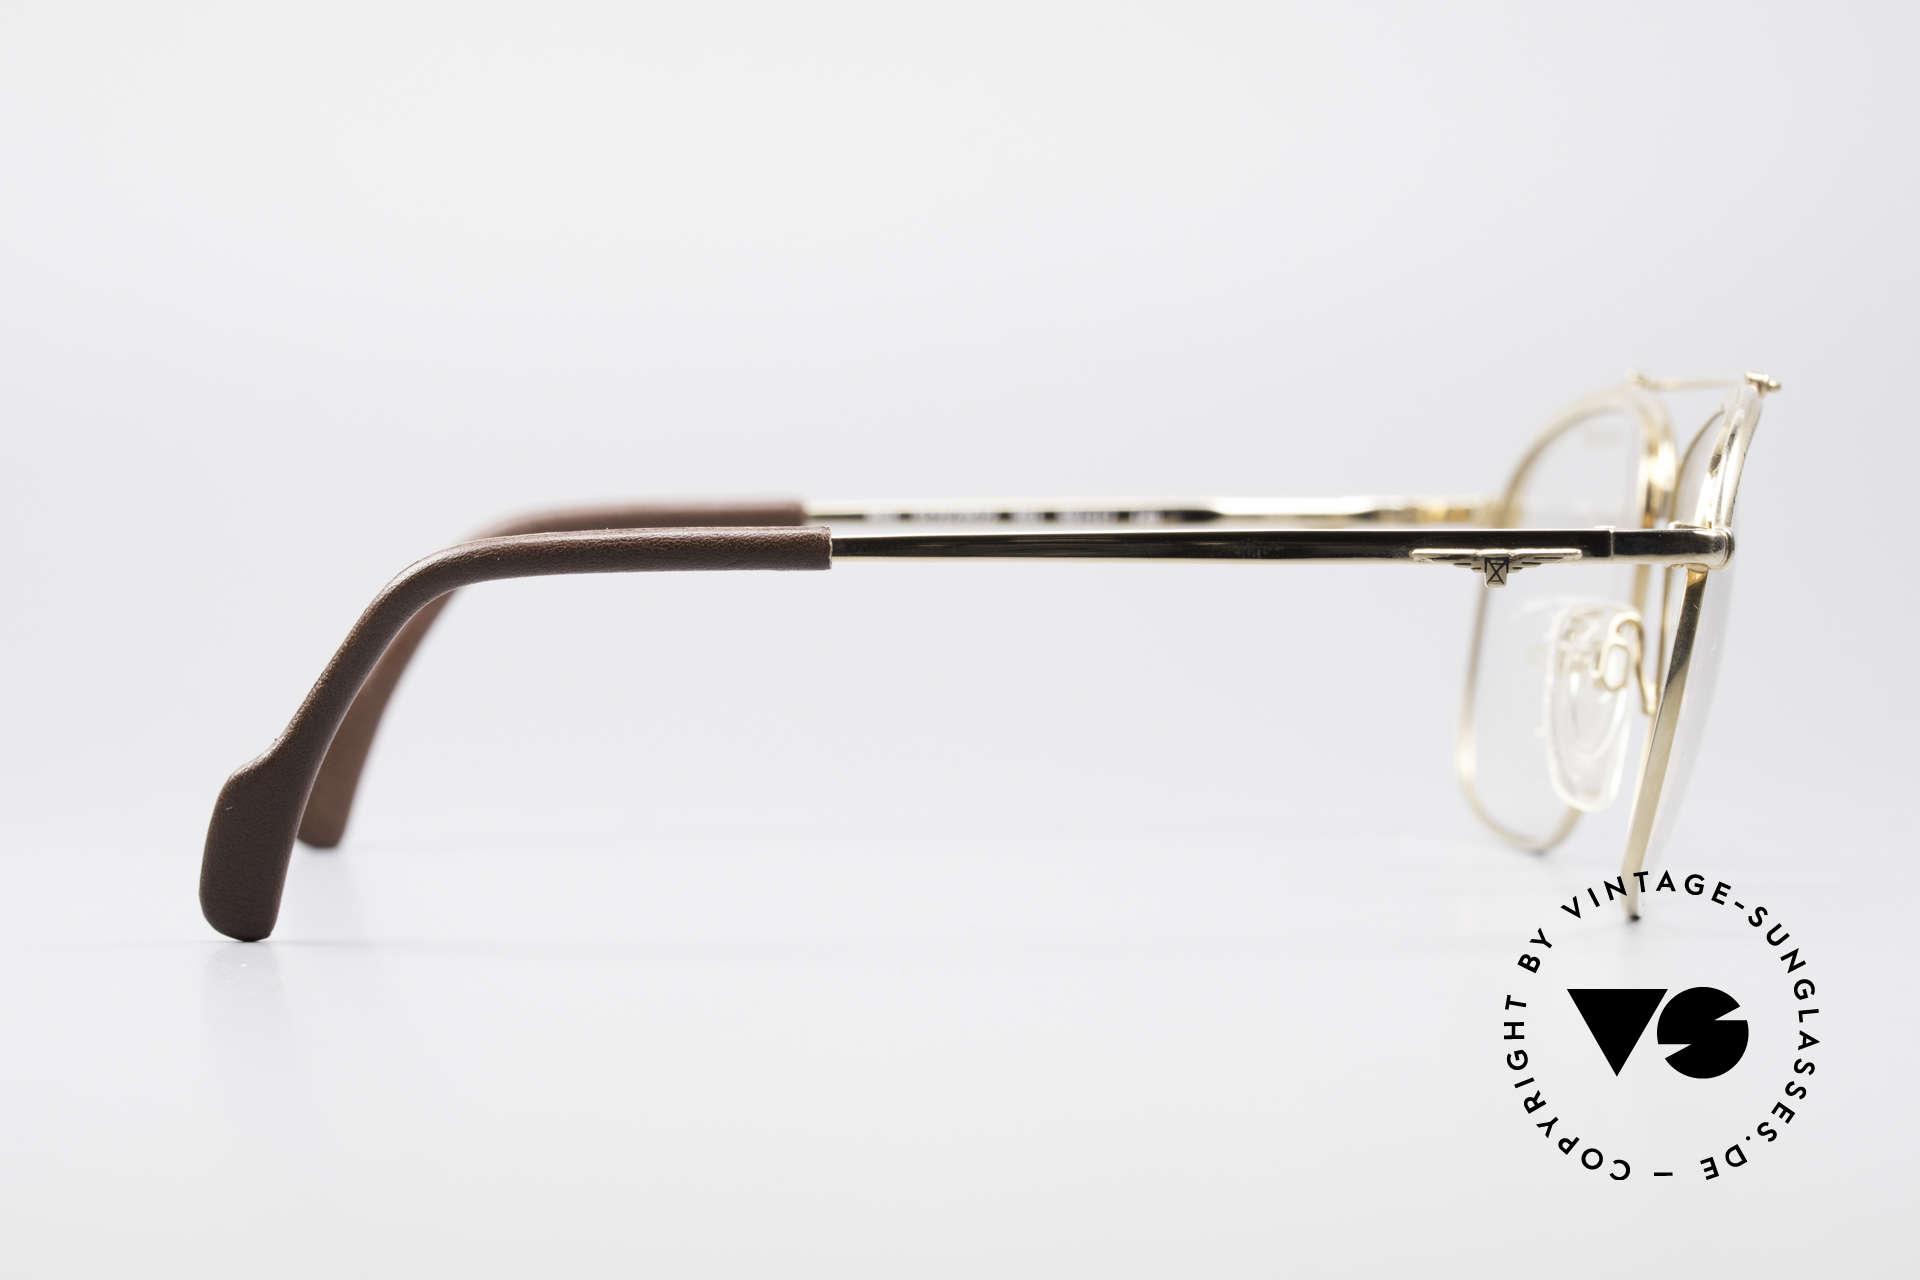 Longines 0172 80's Luxury Eyeglasses, just precious, unique, rare and top-notch craftsmanship, Made for Men